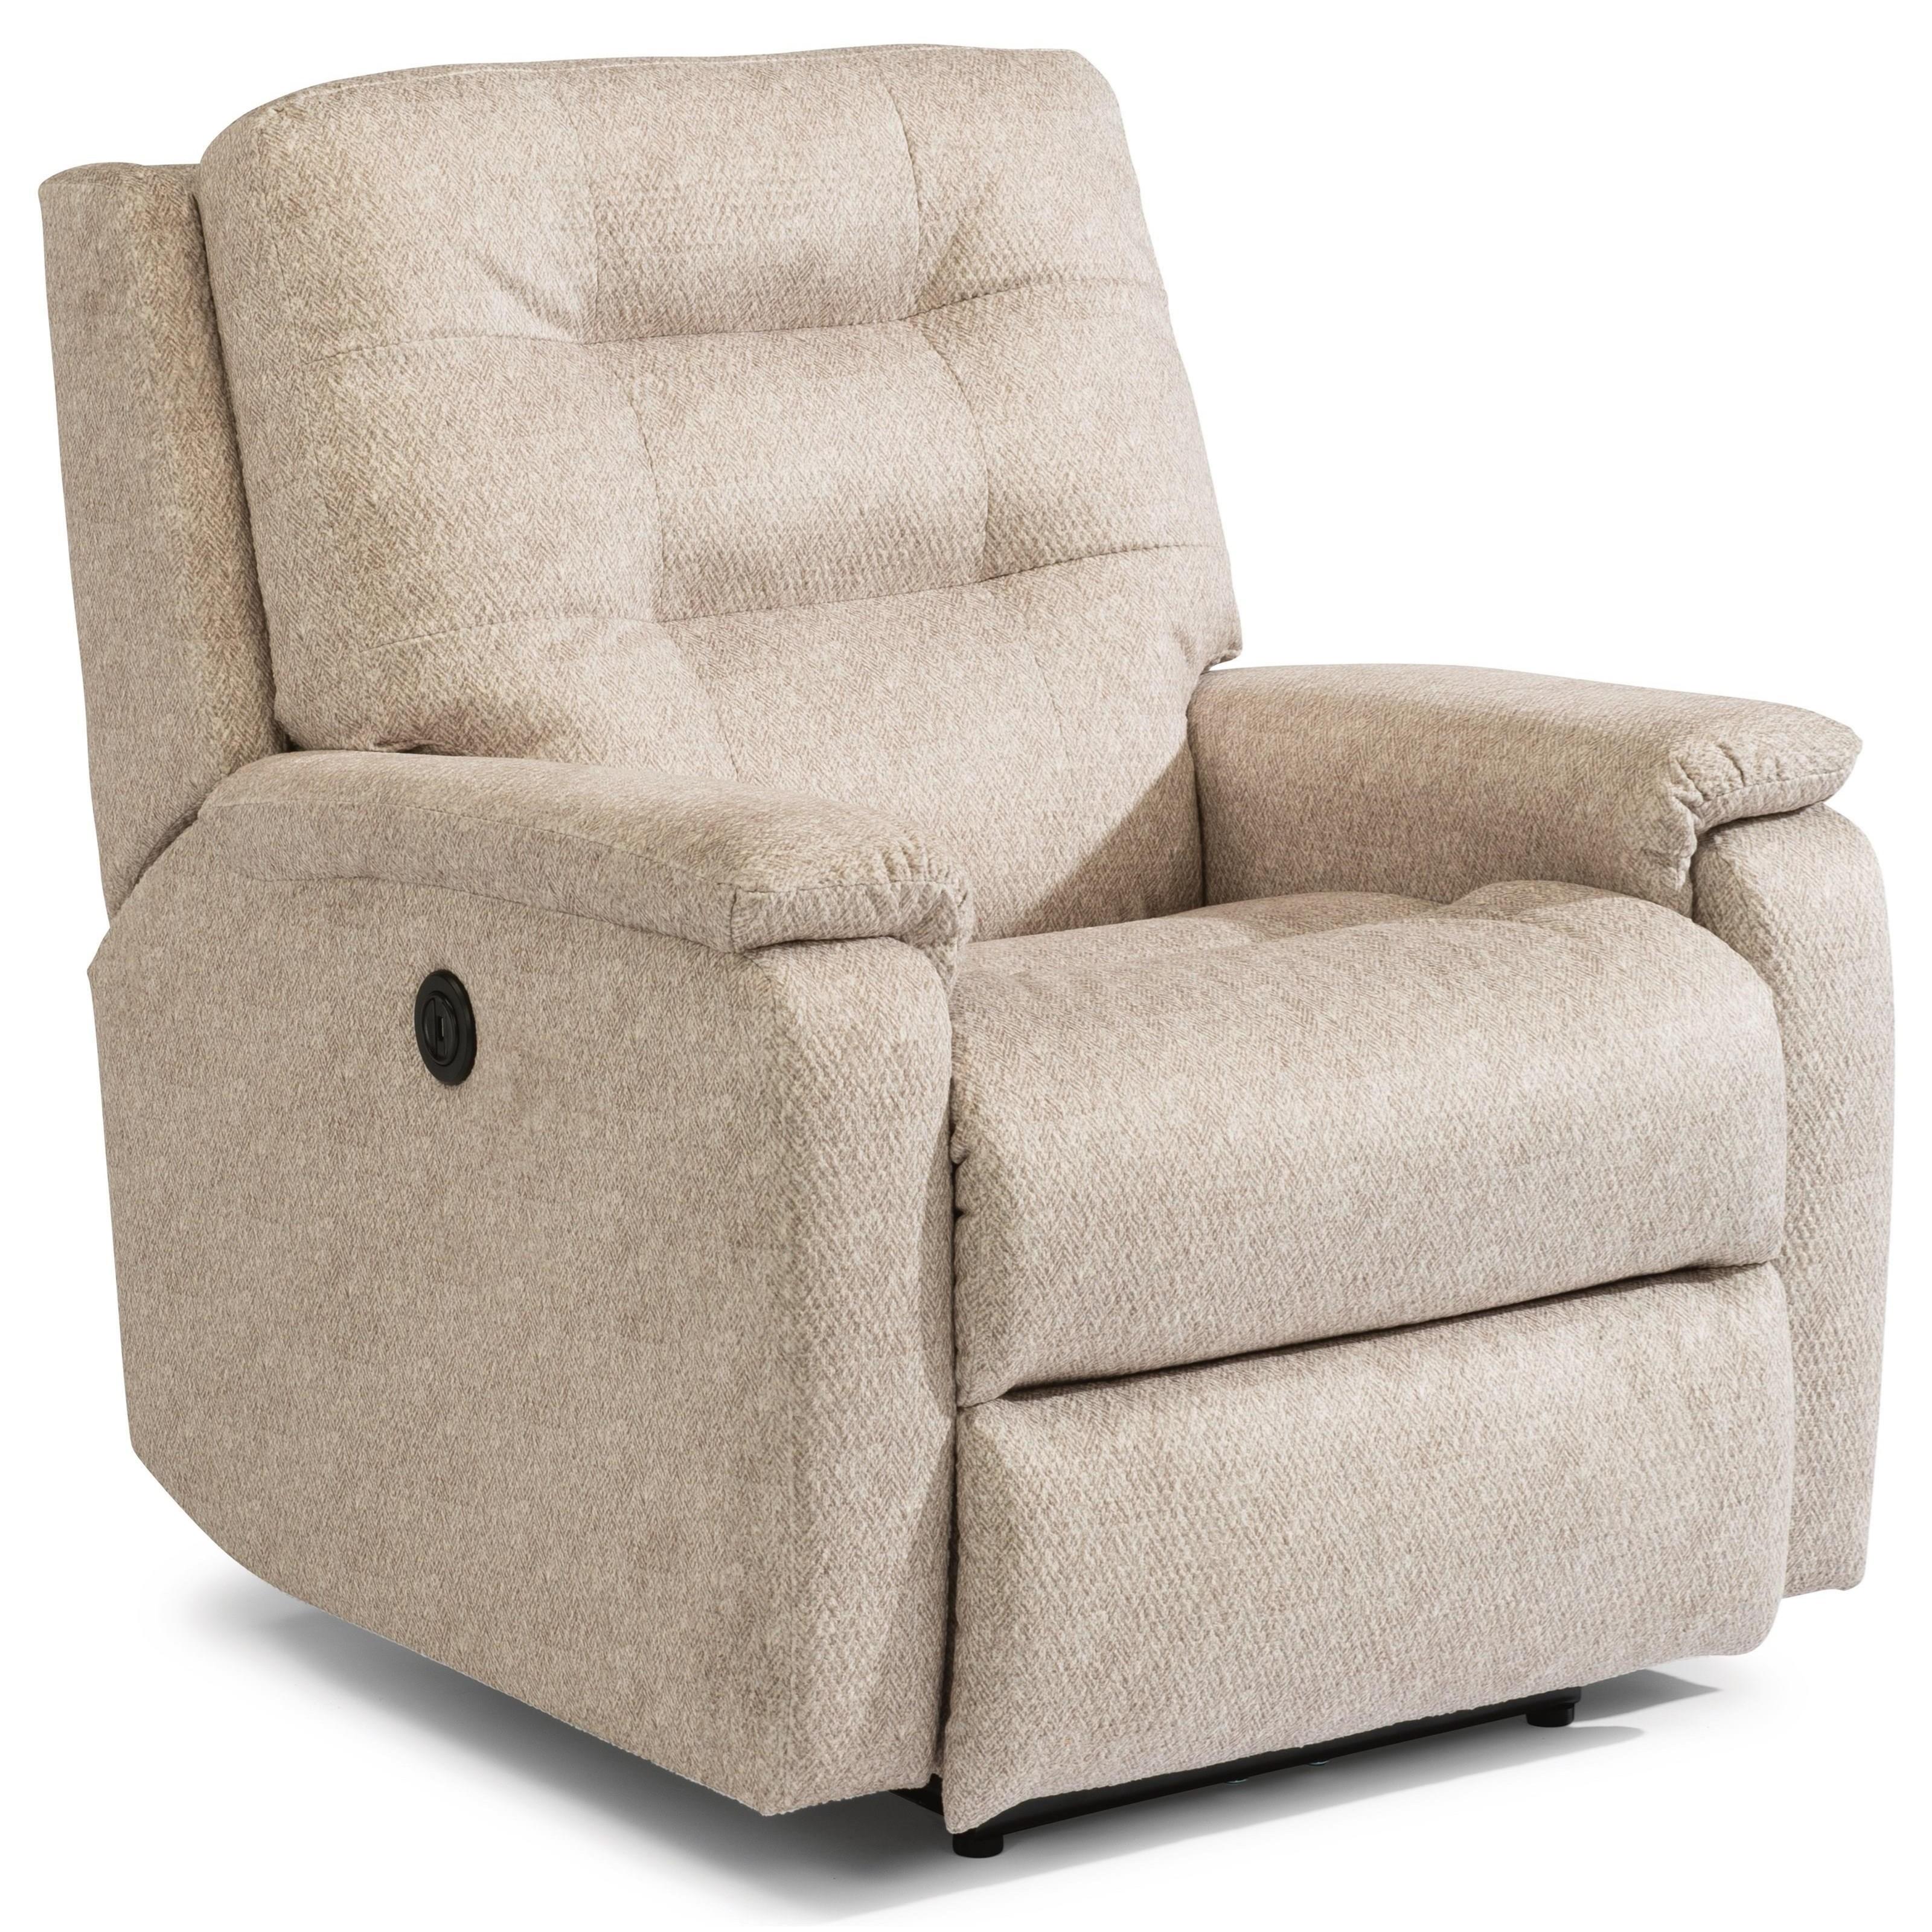 Caleb Rocking Recliner  by Flexsteel at Steger's Furniture